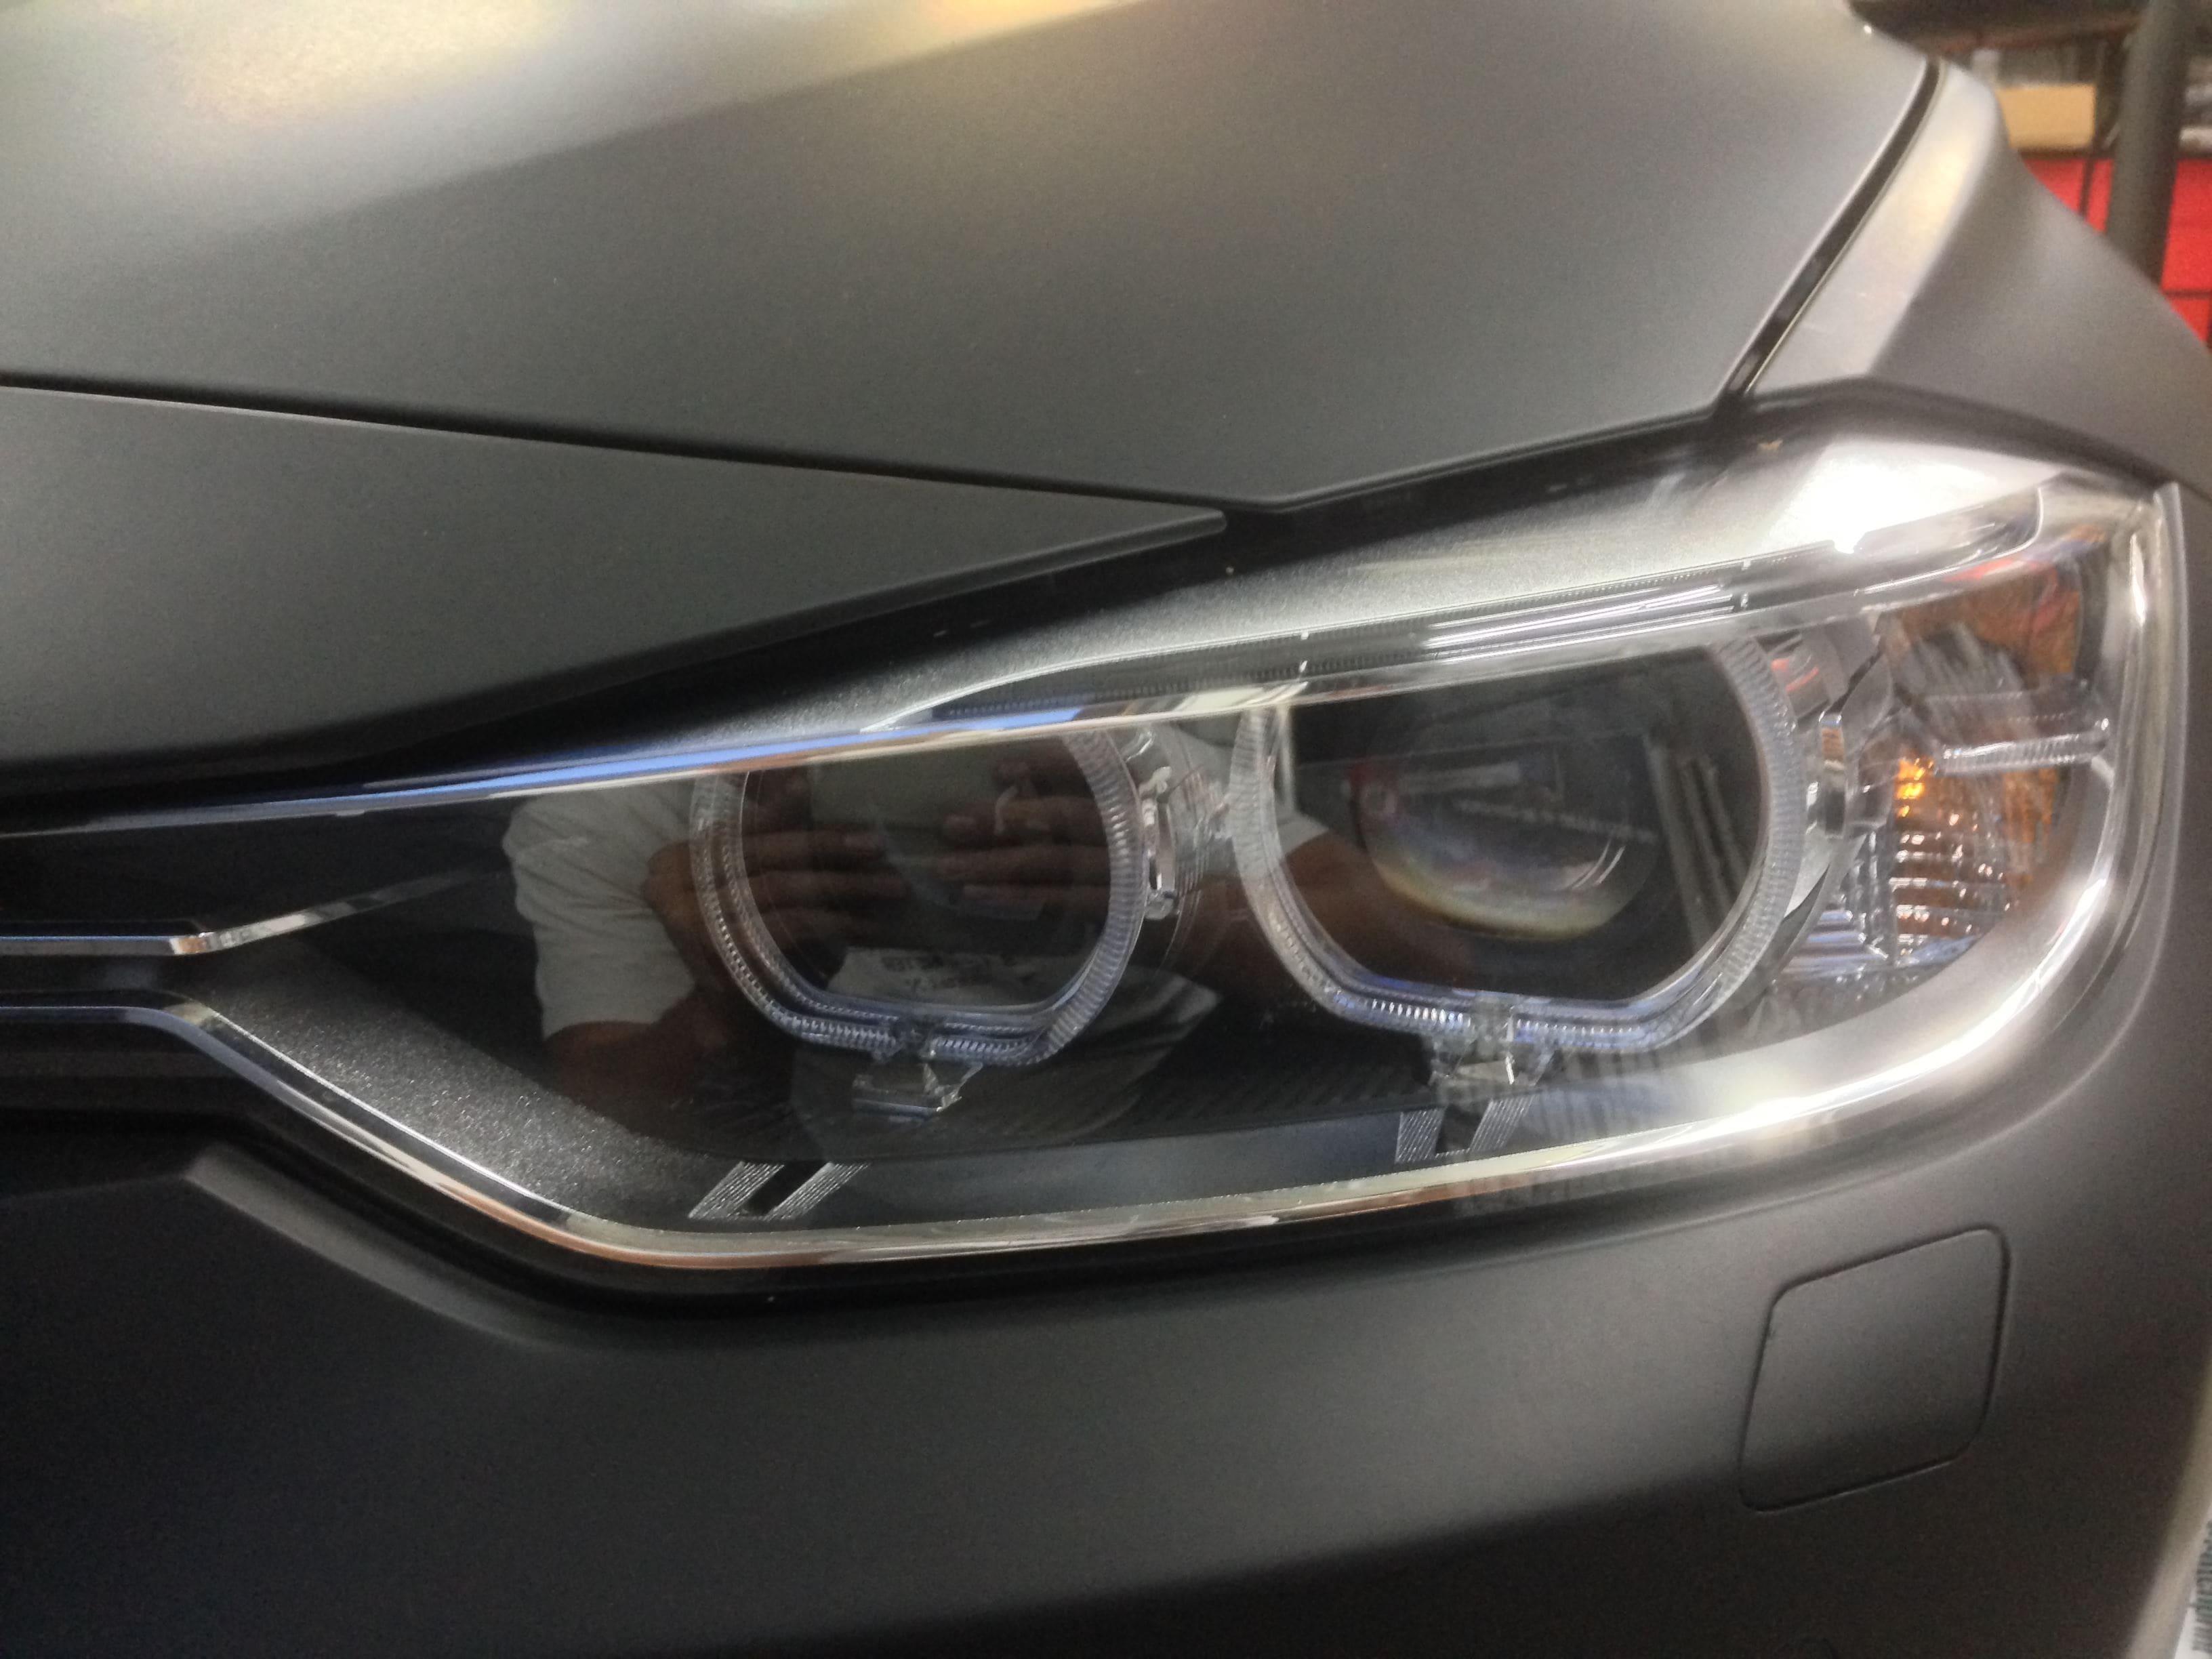 BMW E92 3 Serie met Mat Zwarte Wrap, Carwrapping door Wrapmyride.nu Foto-nr:5405, ©2020